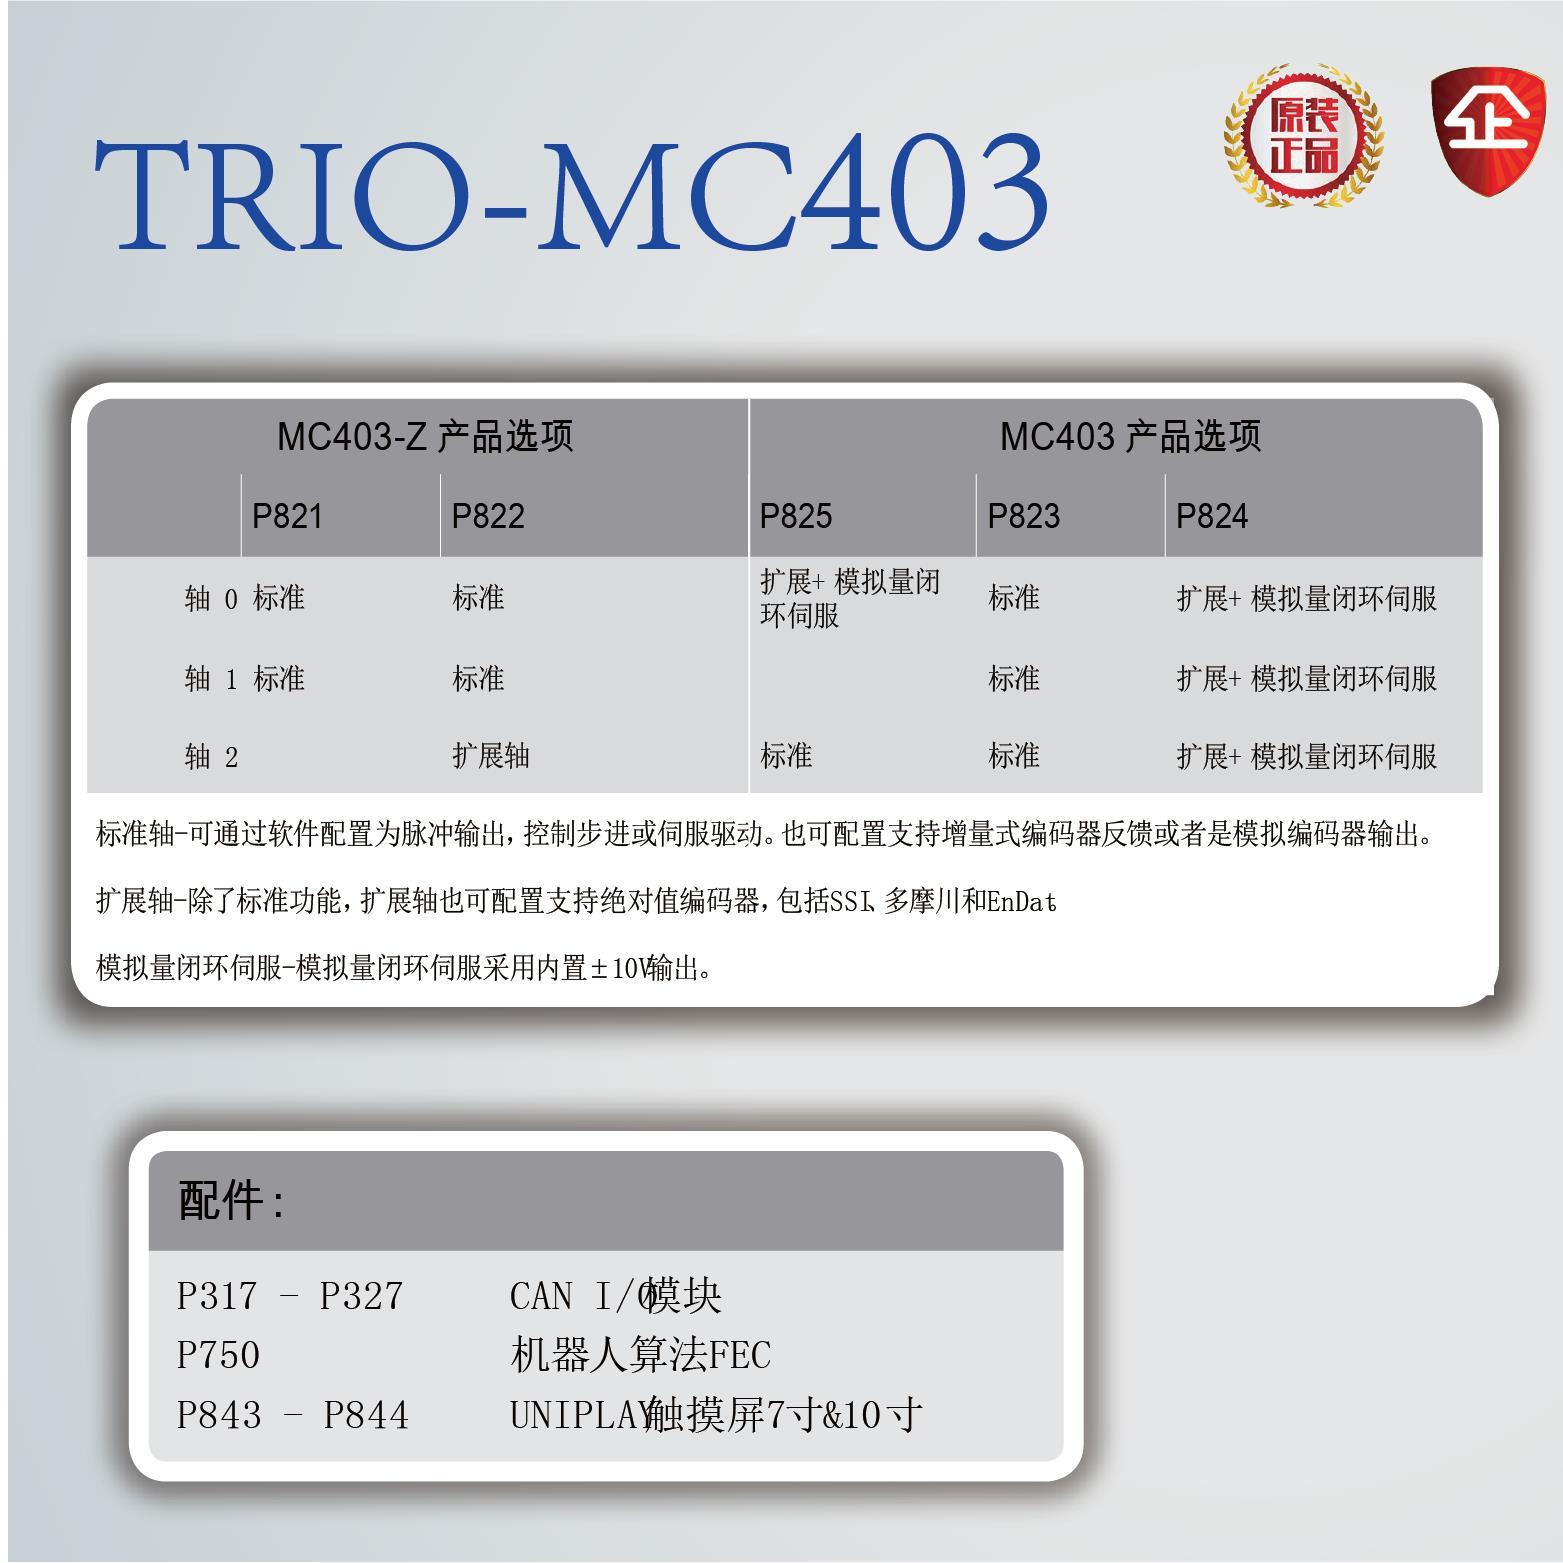 TRIO MC403三轴运动控制器P823 P824